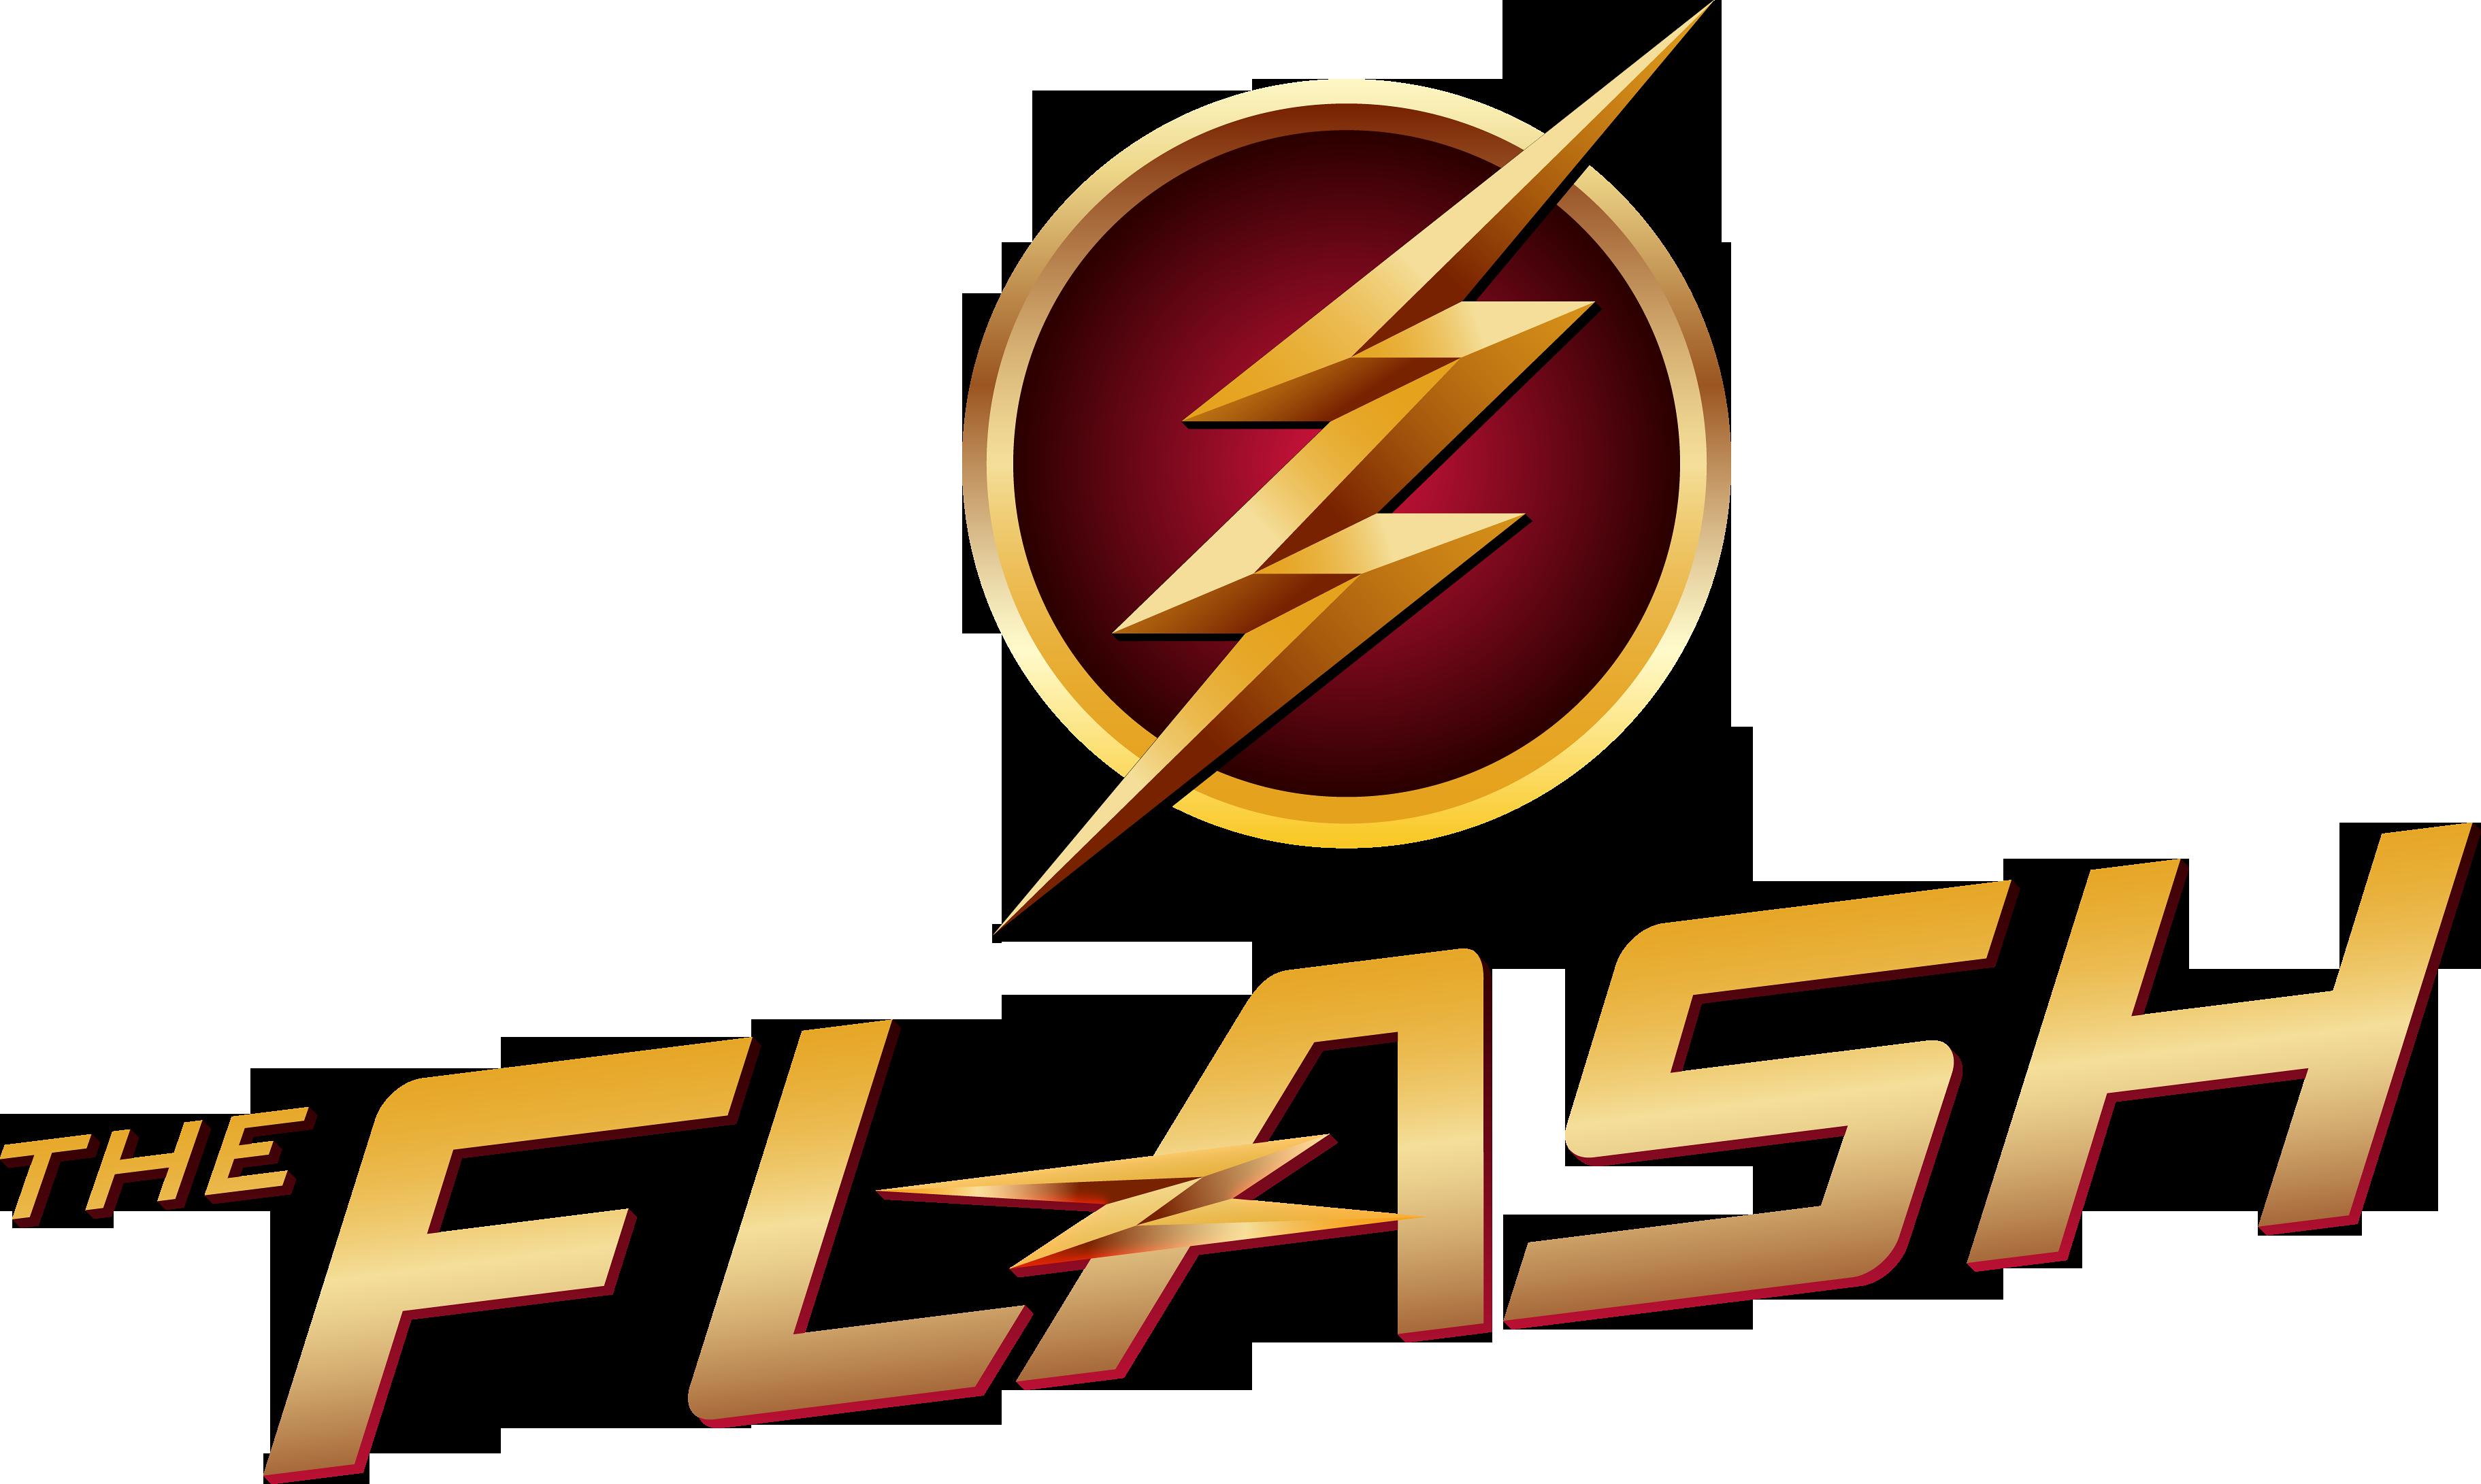 11 flash logo vector images flash logo flash superhero